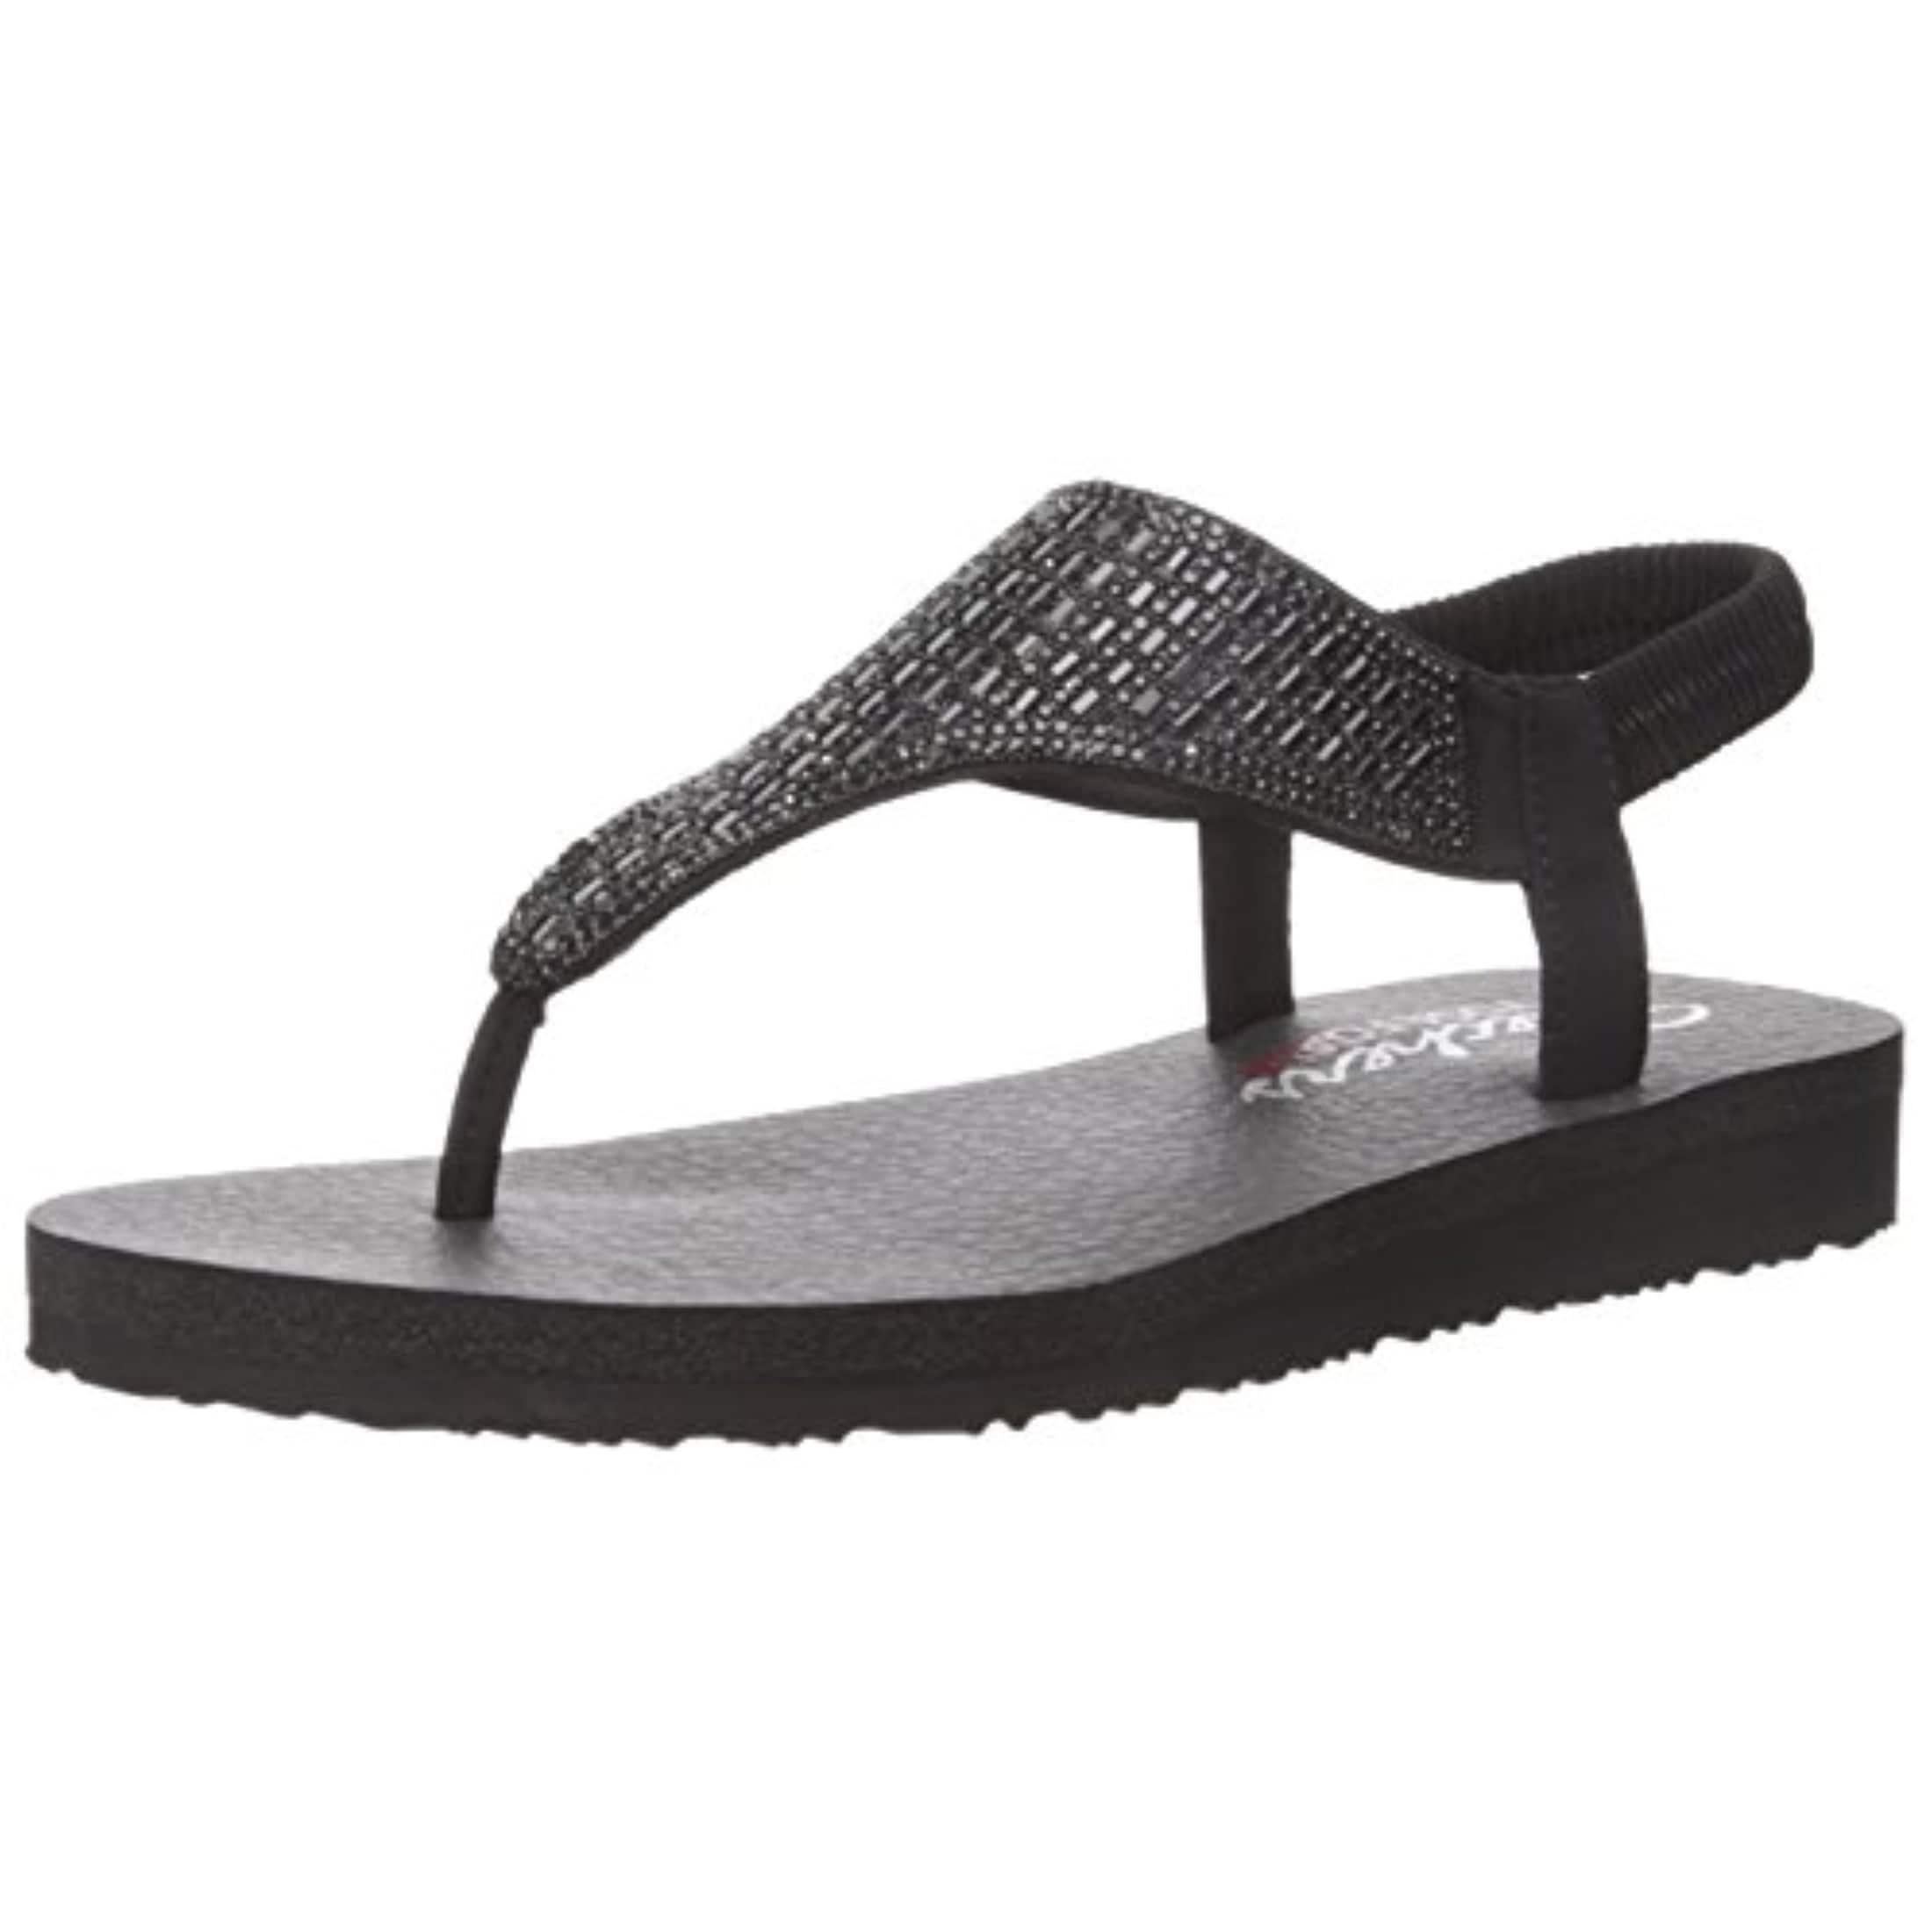 8867045d155e Shop Skechers Cali Women s Meditation-Rock Crown Flat Sandal - Free  Shipping Today - Overstock - 27124959